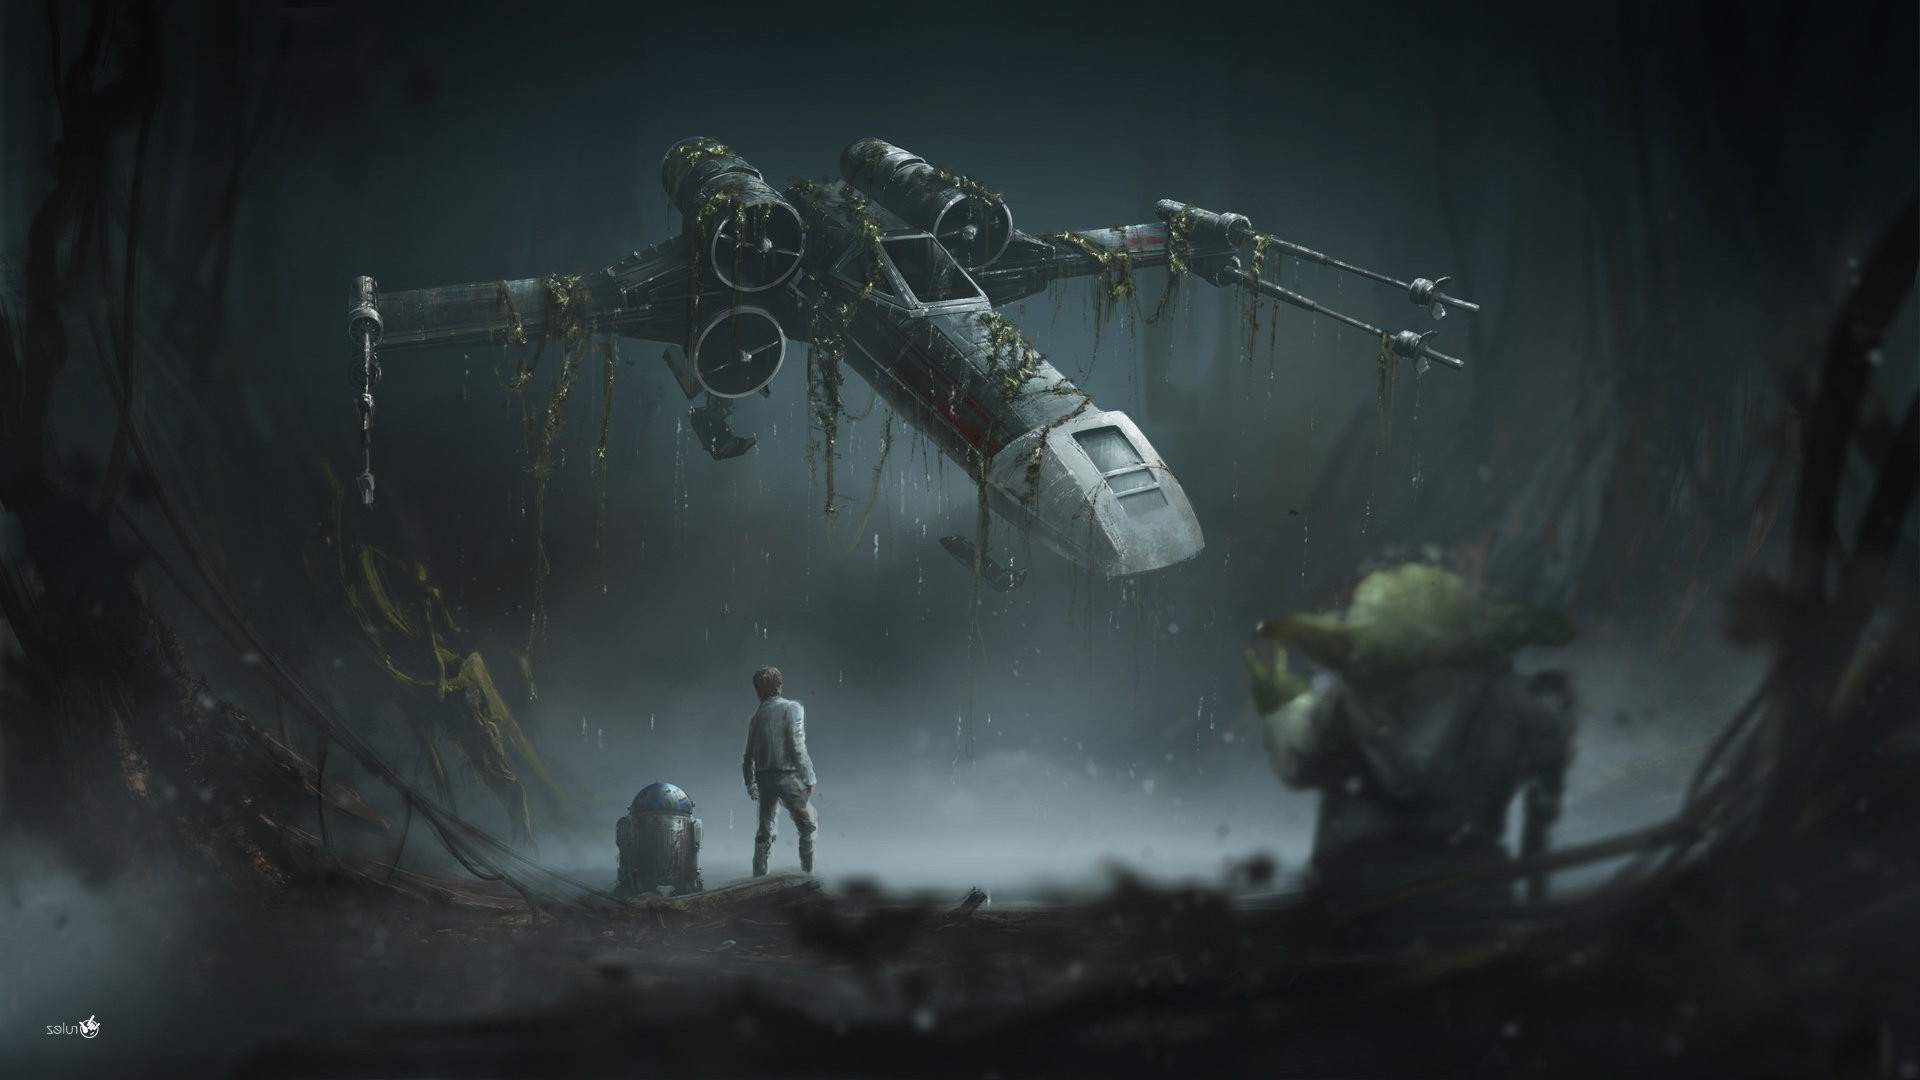 Star Wars, Star Wars: The Empire Strikes Back, X wing, R2 D2, Yoda, Luke  Skywalker Wallpapers HD / Desktop and Mobile Backgrounds